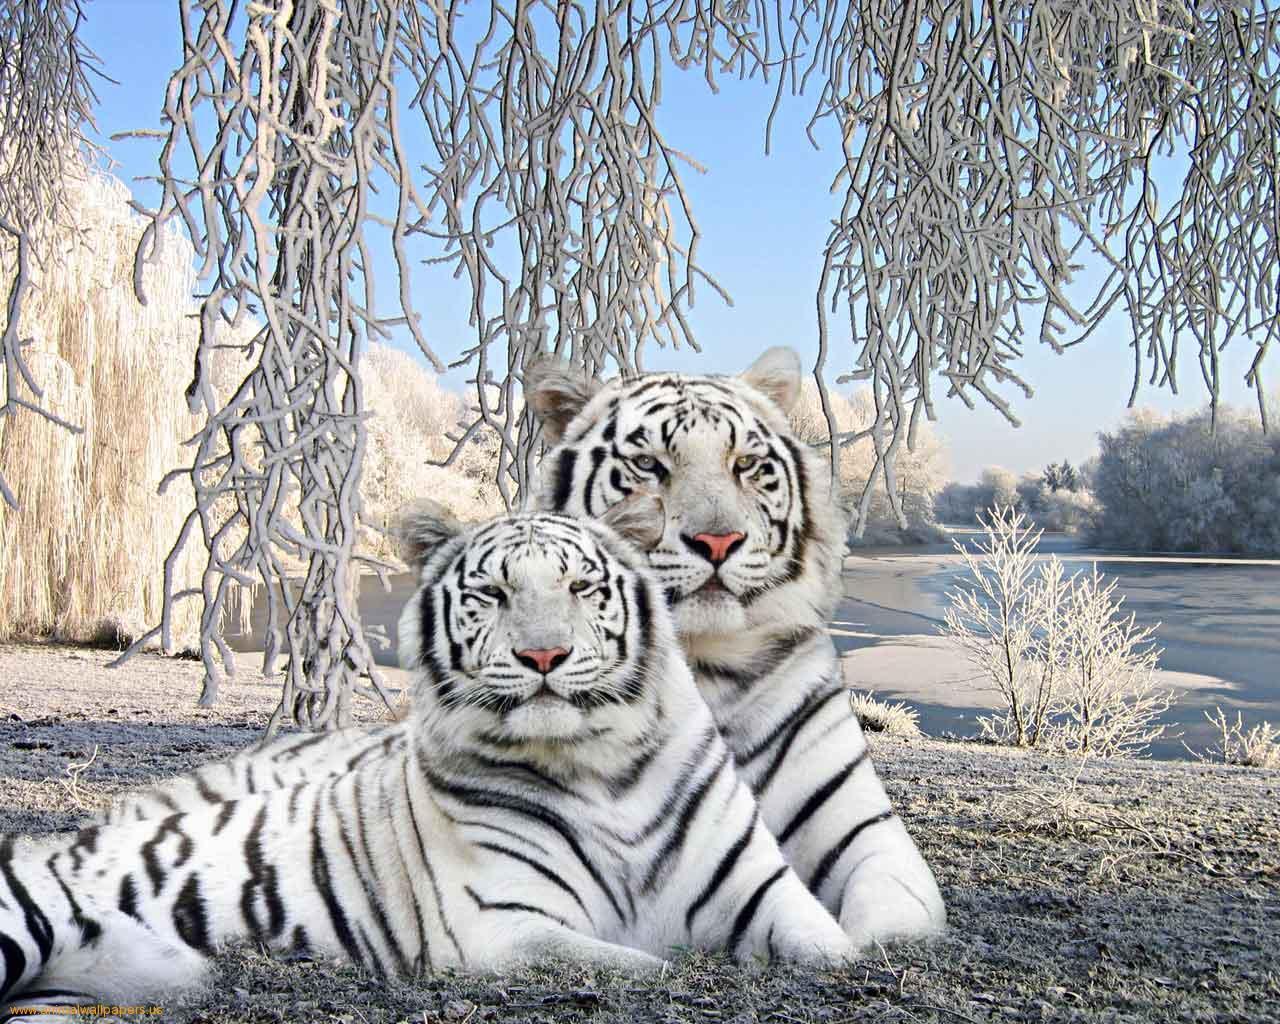 tiger wallpaper widescreen - photo #8